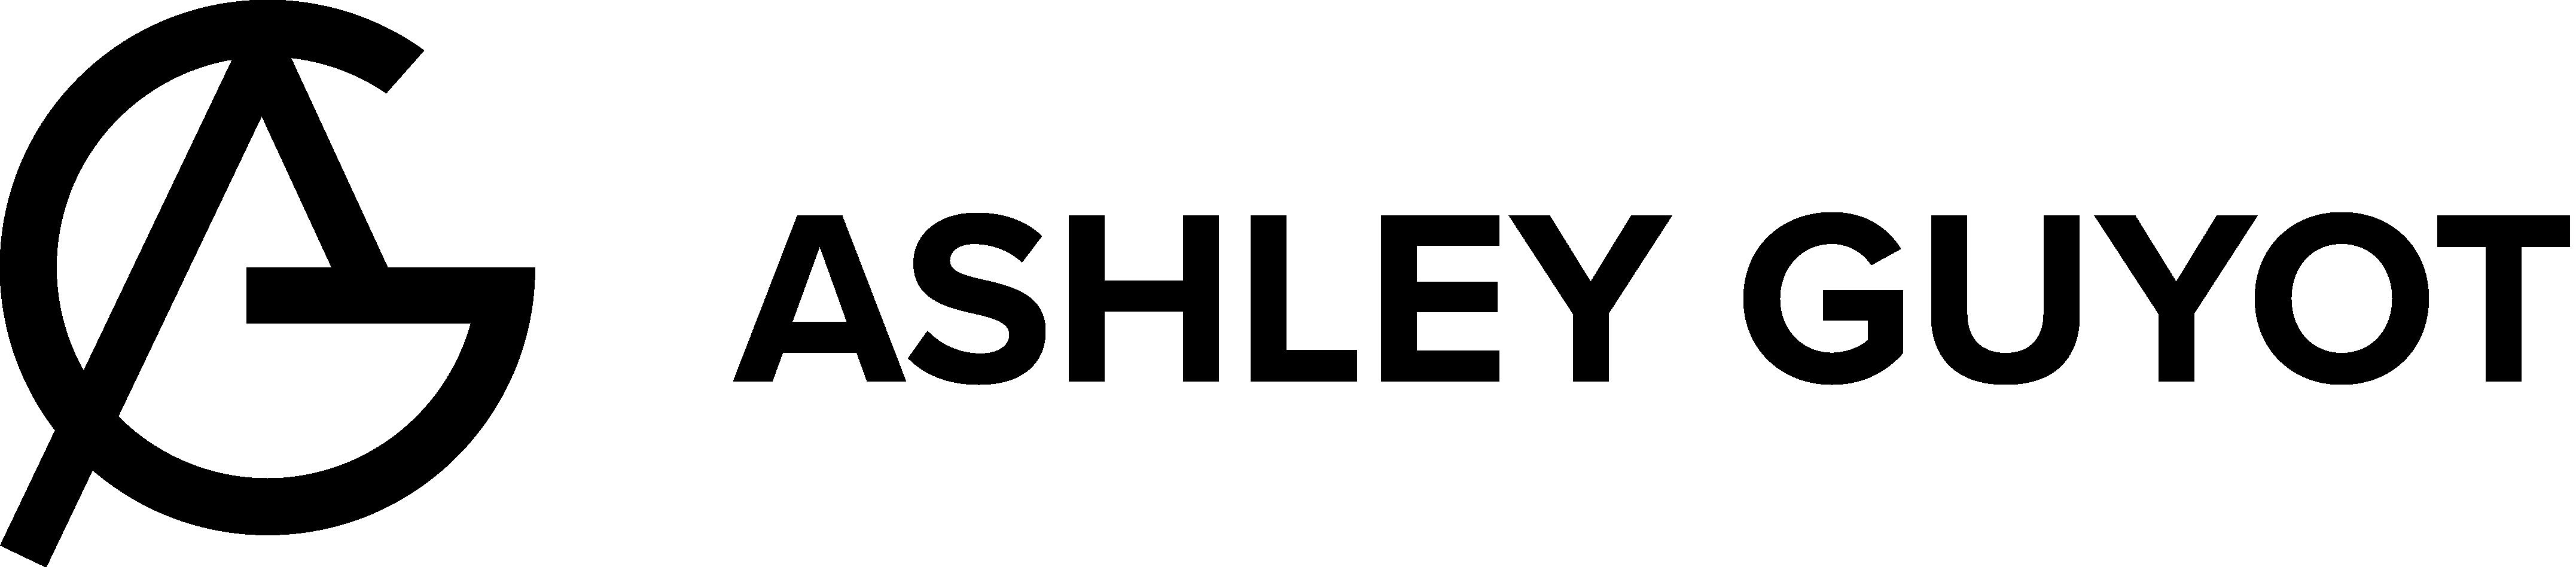 Ashley Guyot